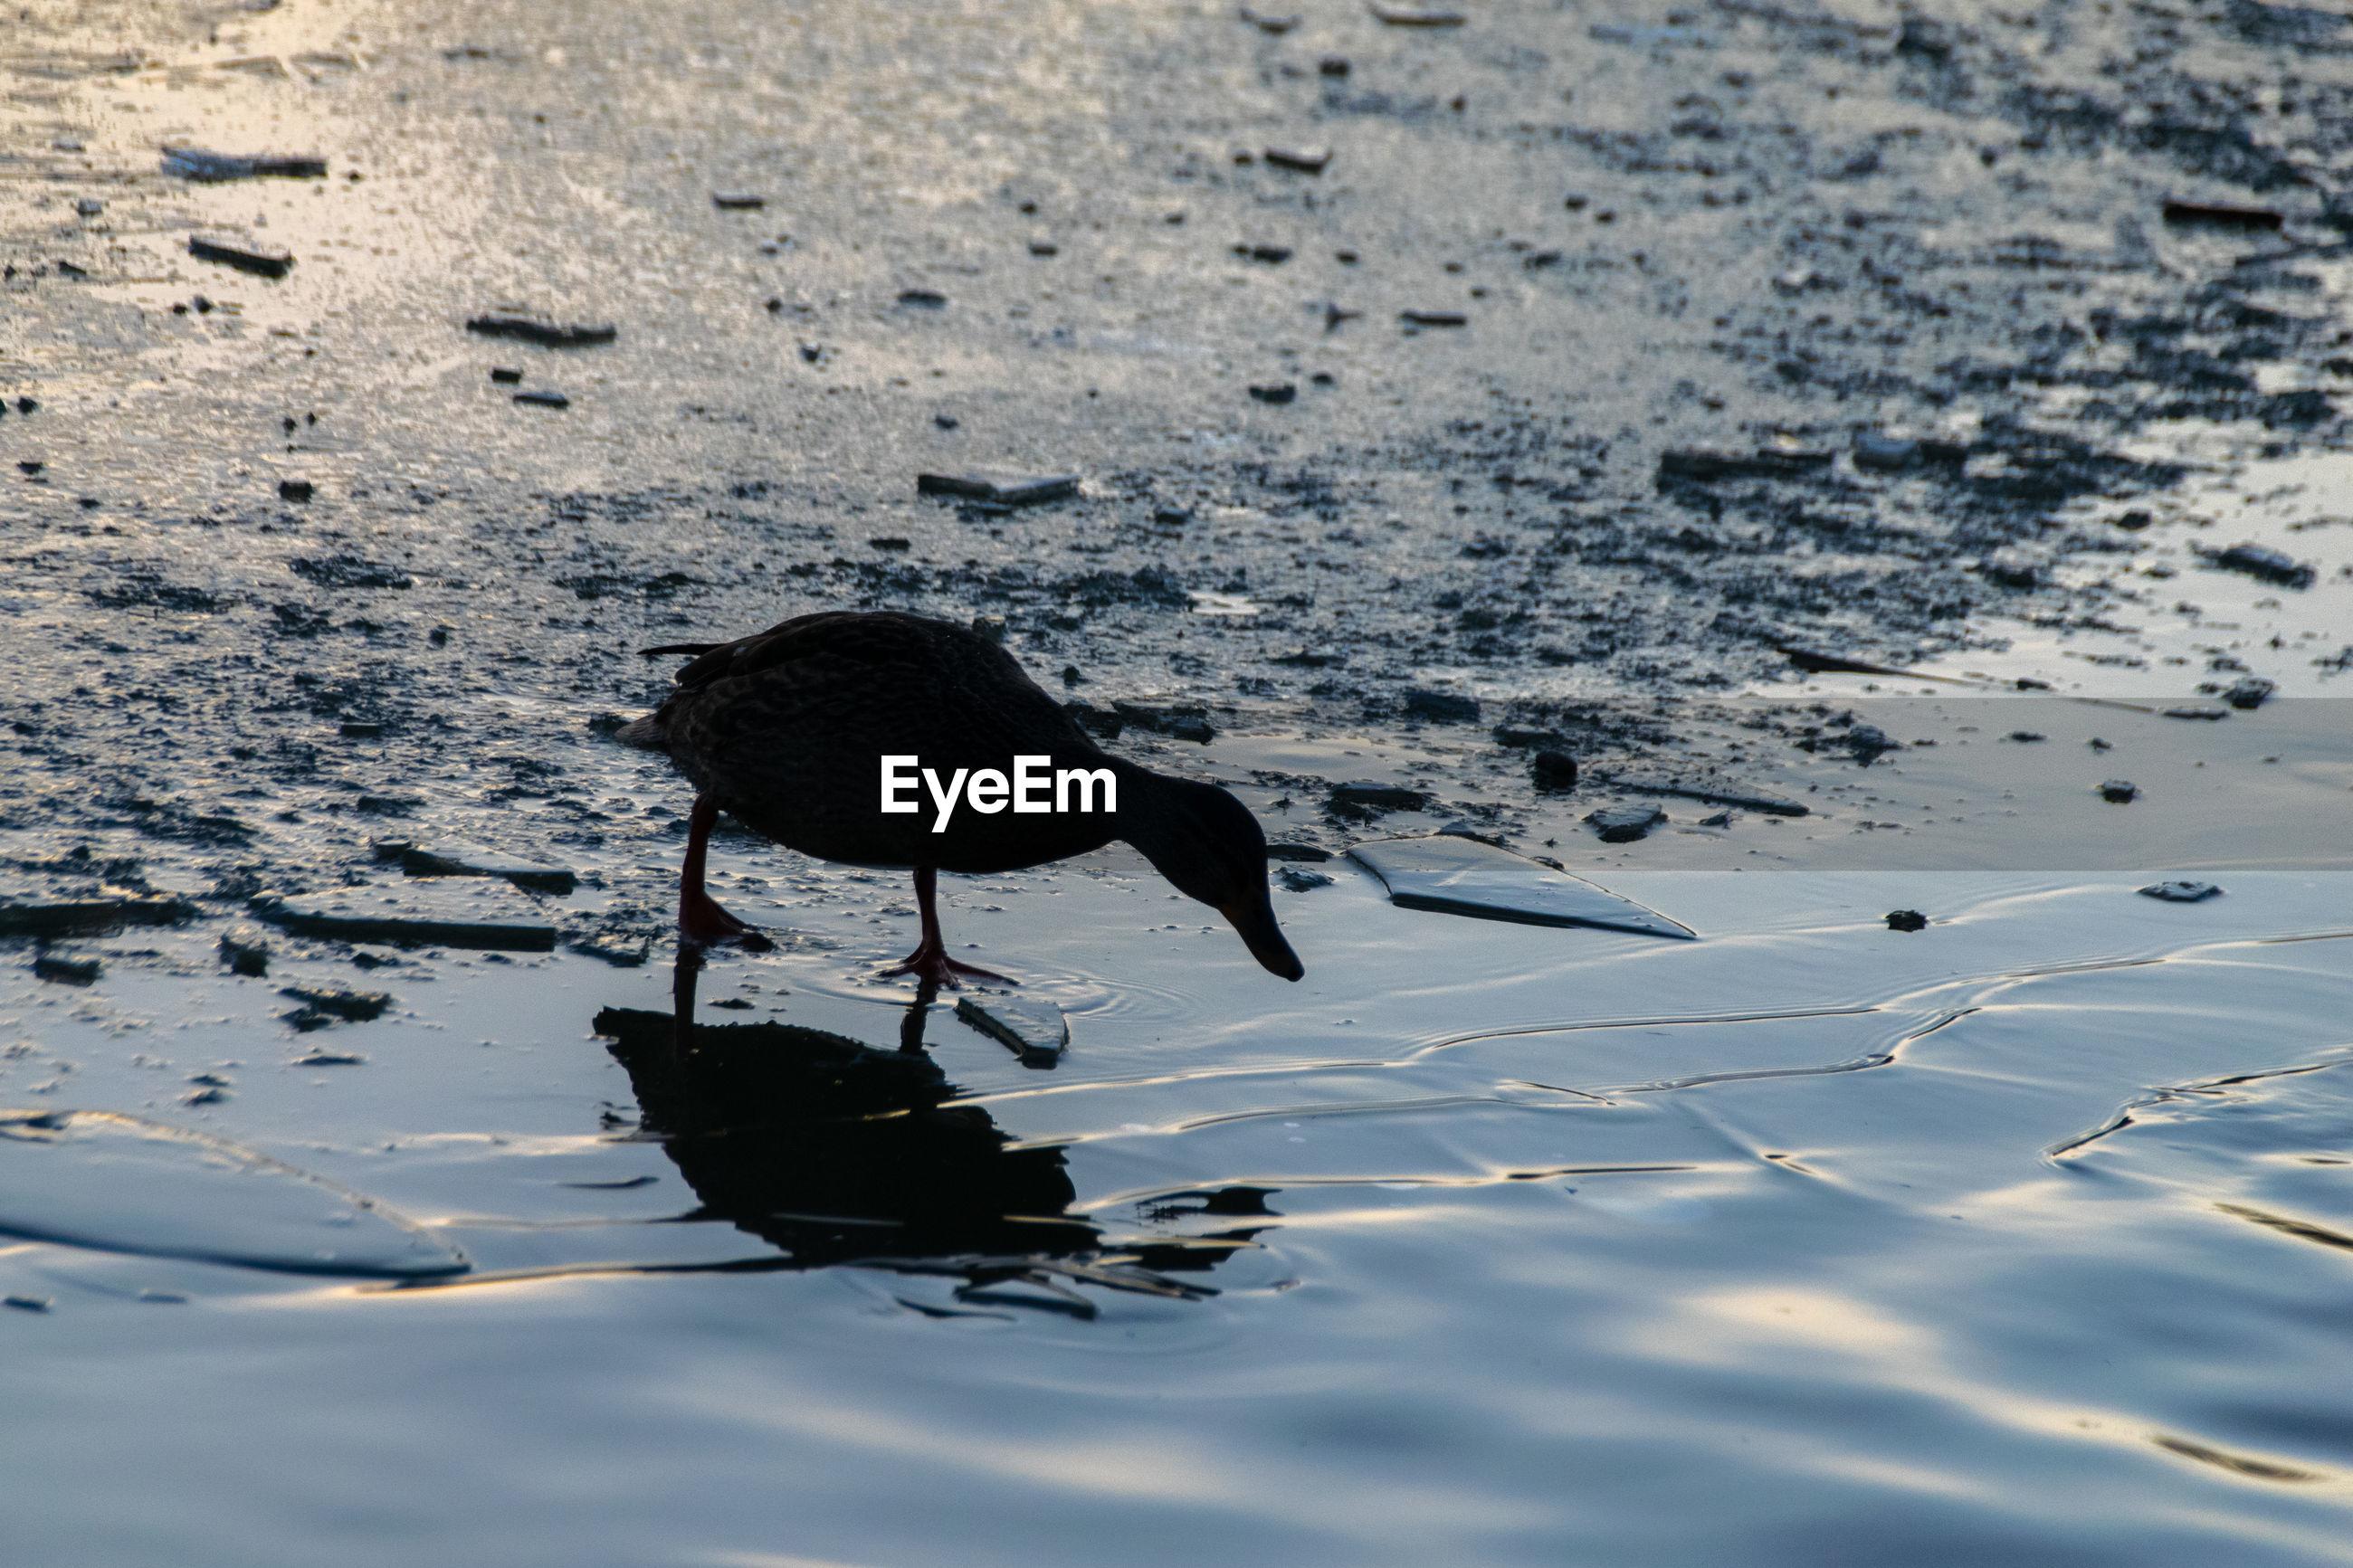 Mallard duck standing on a frozen lake